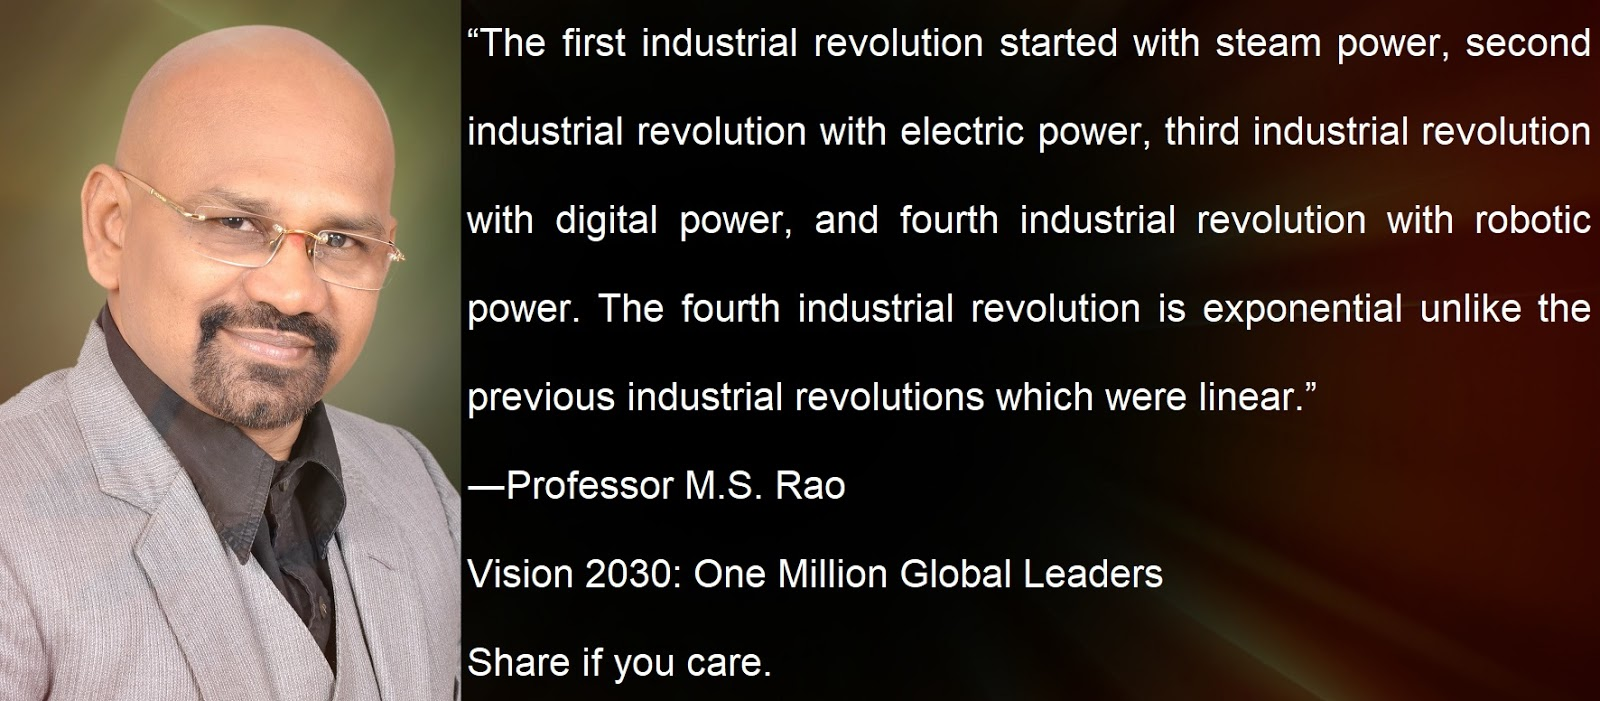 Professor M S Raos Vision 2030 One Million Global Leaders